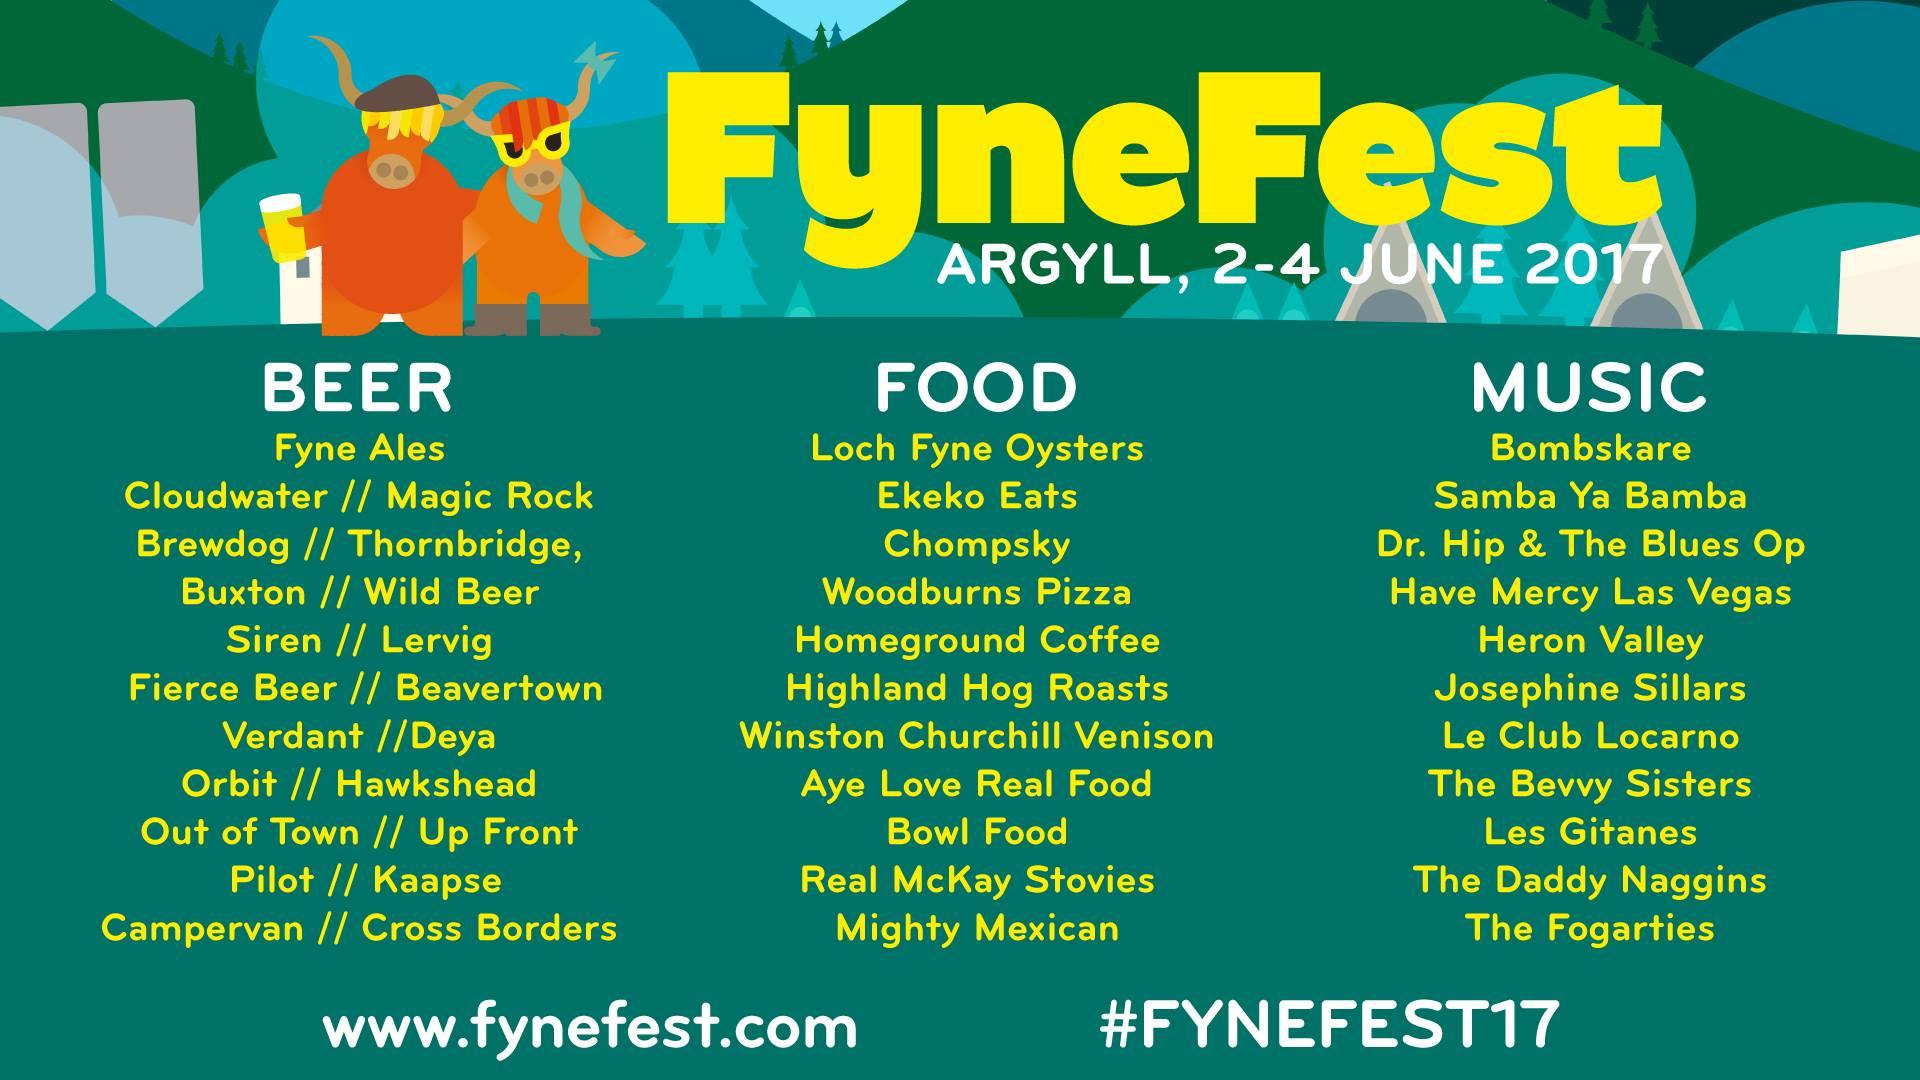 Fynefest Promo